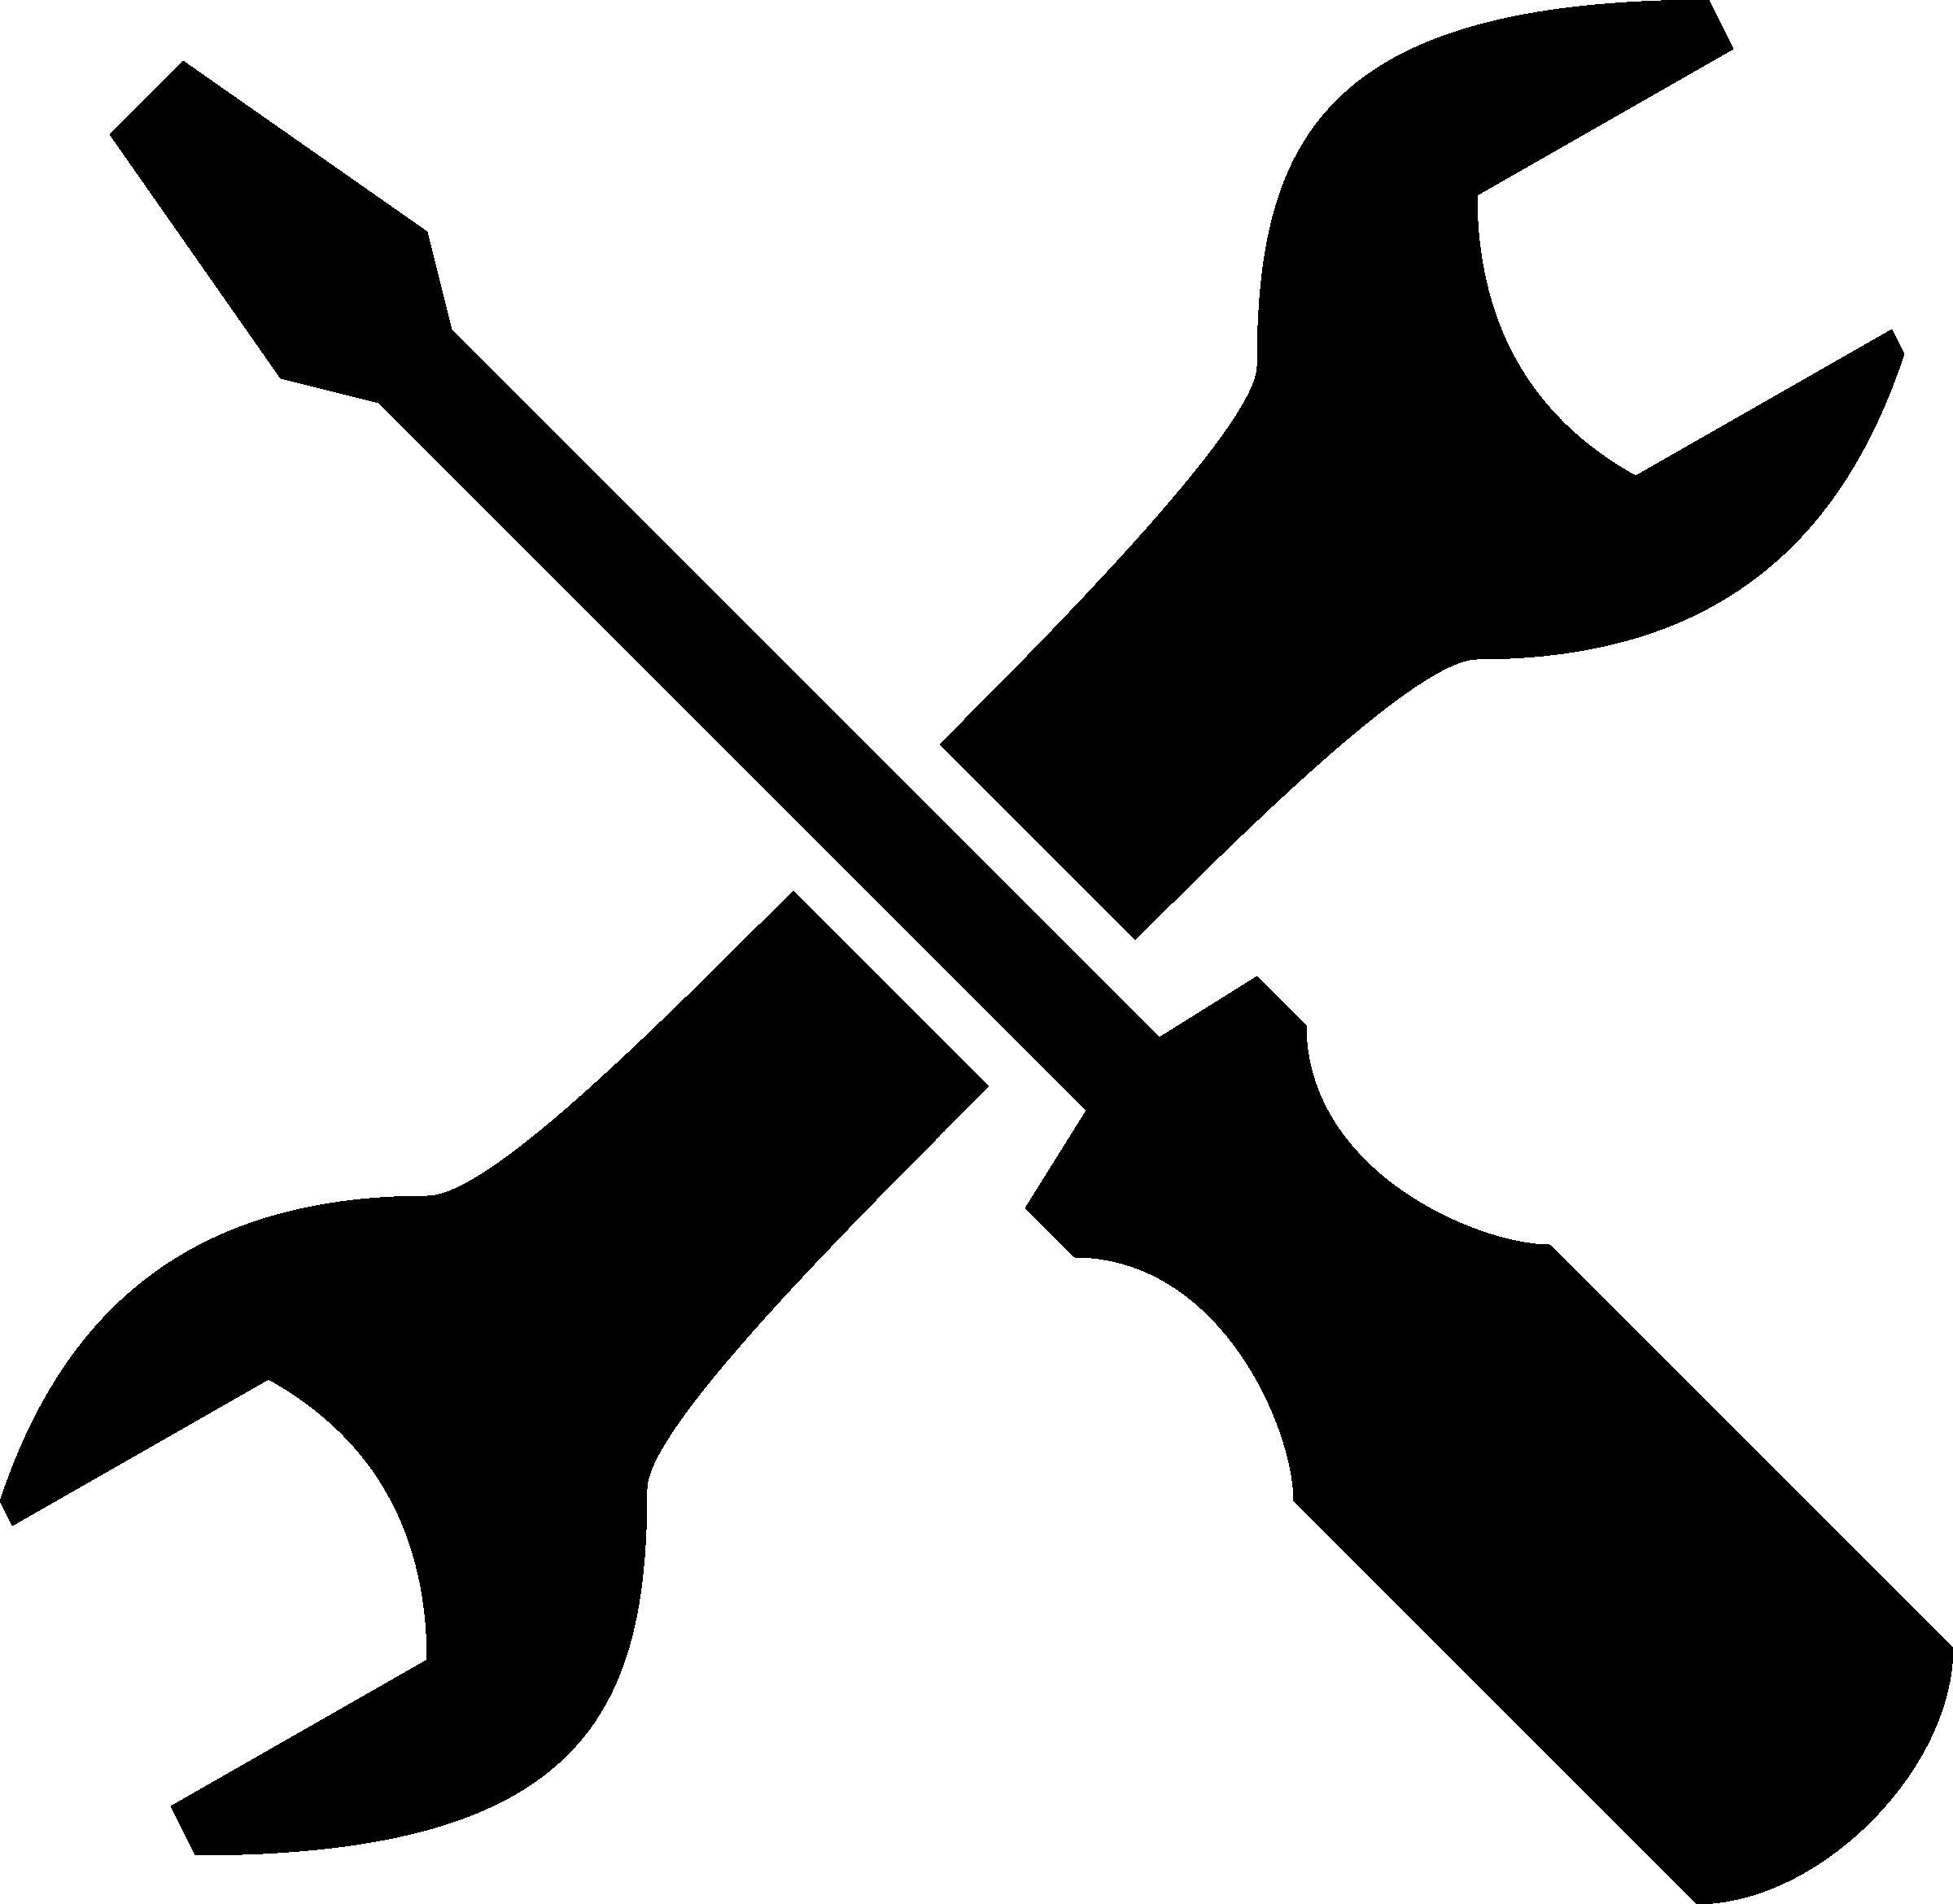 Unique Construction Tools Clip Art Black And White Design.